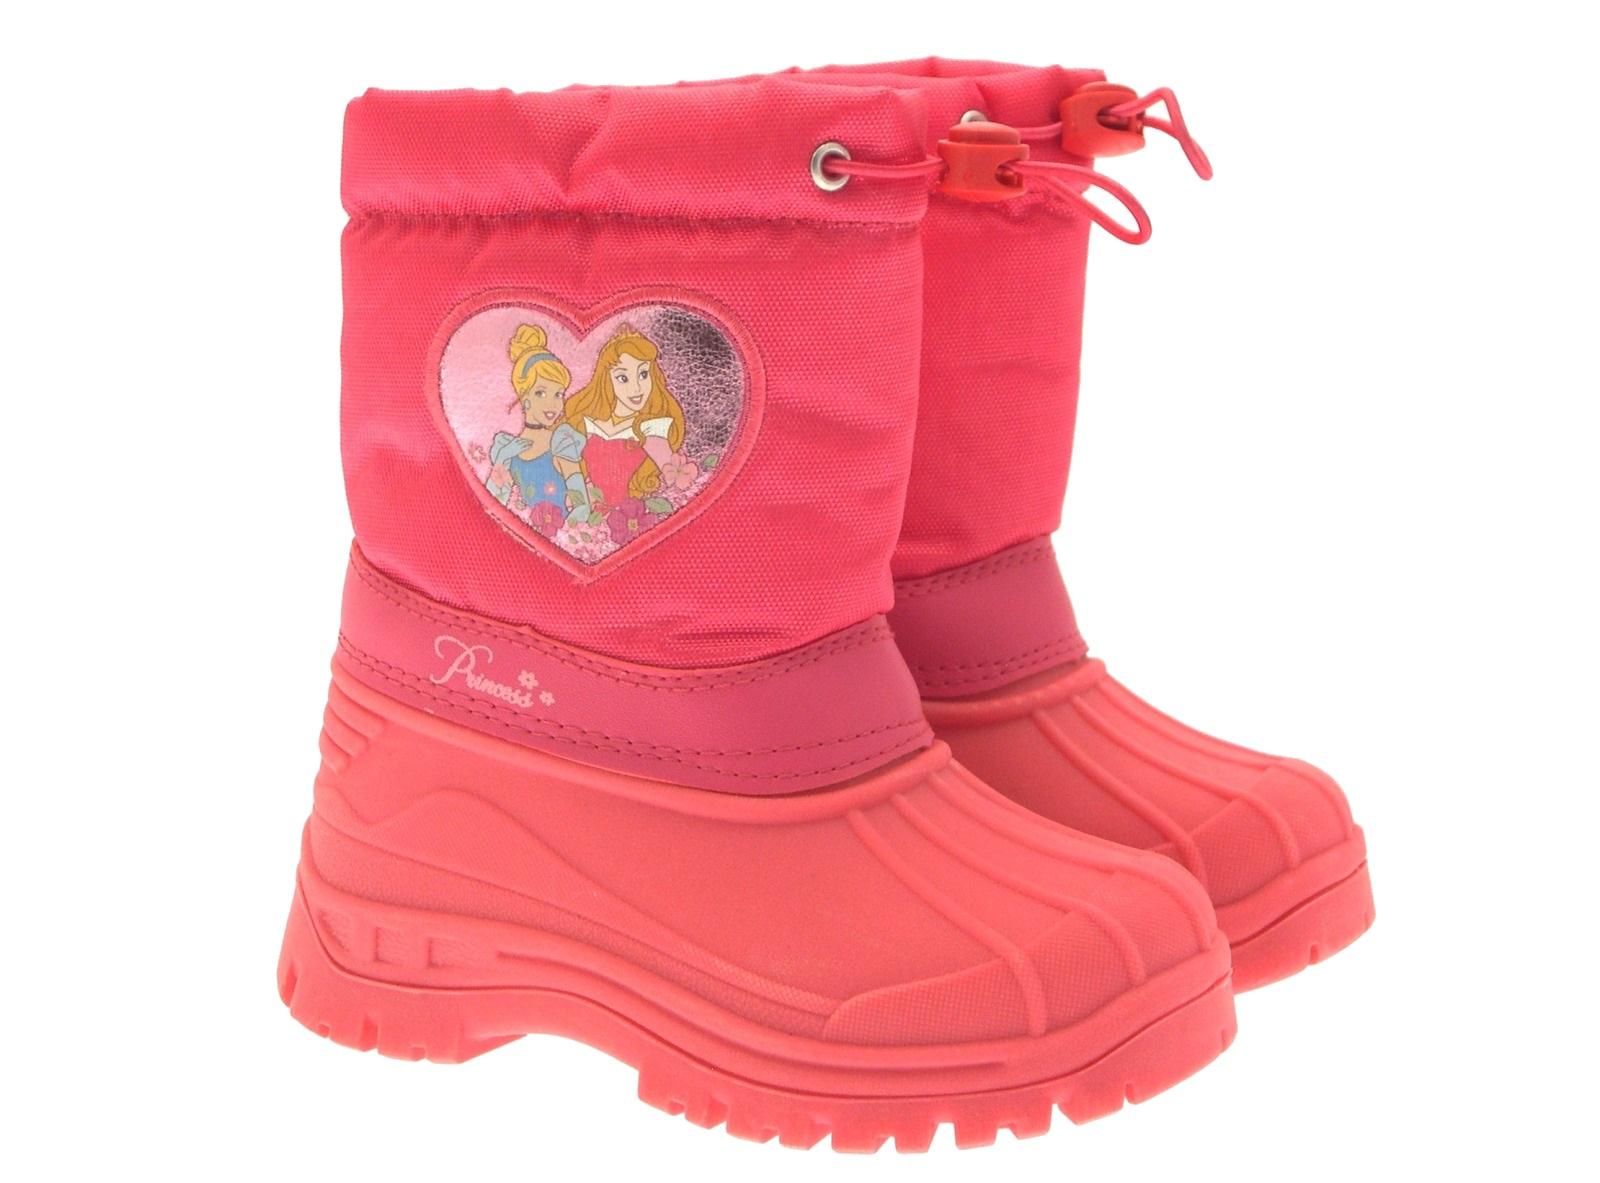 Kids Girls Disney Princess Pink Rain Snow Boots Wellies